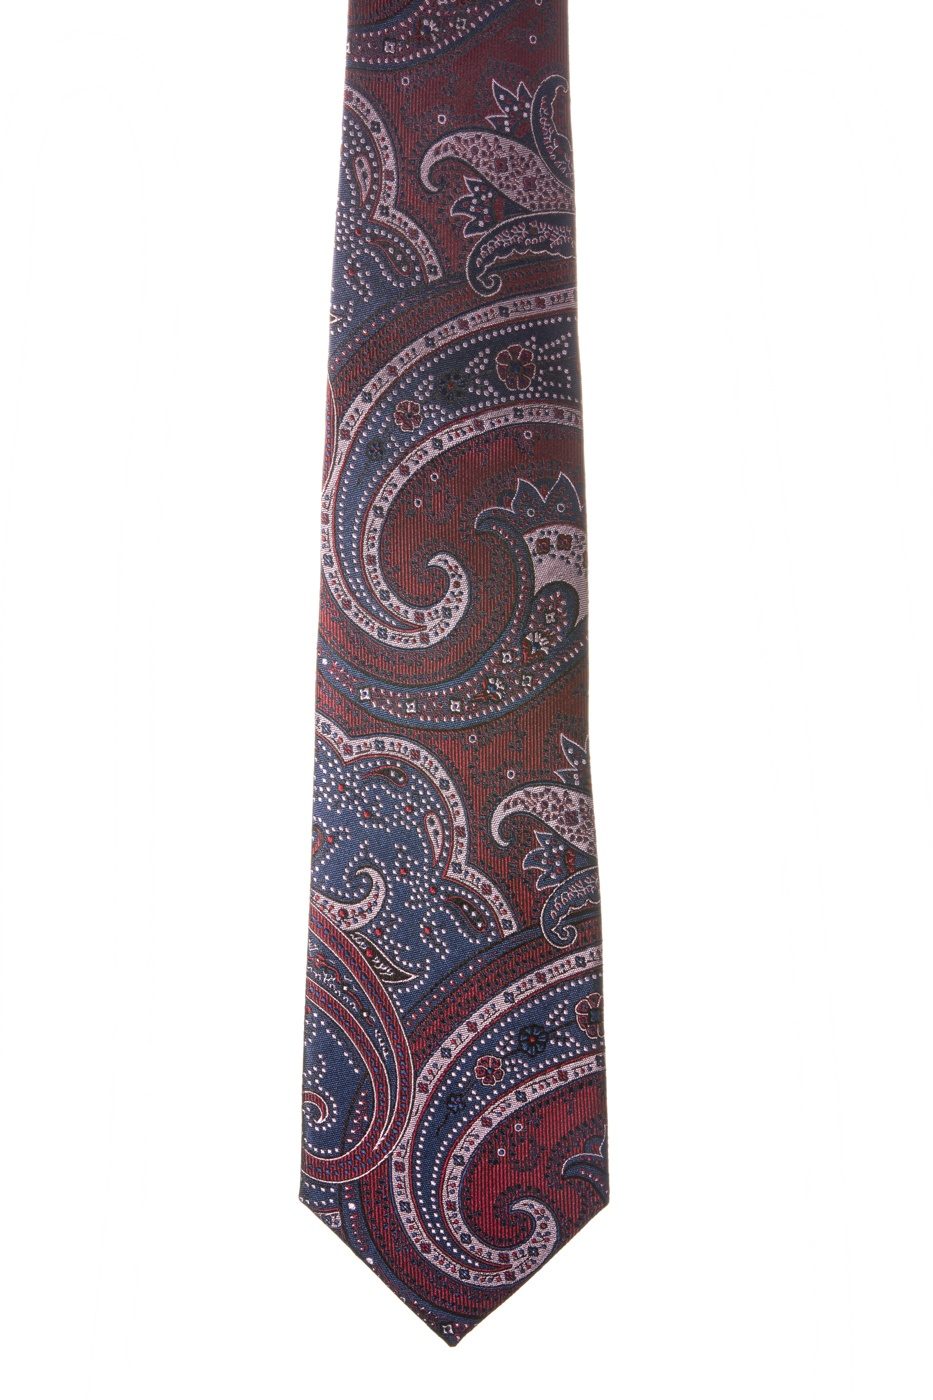 Corbata burdeos dibujos cachemir azul marino